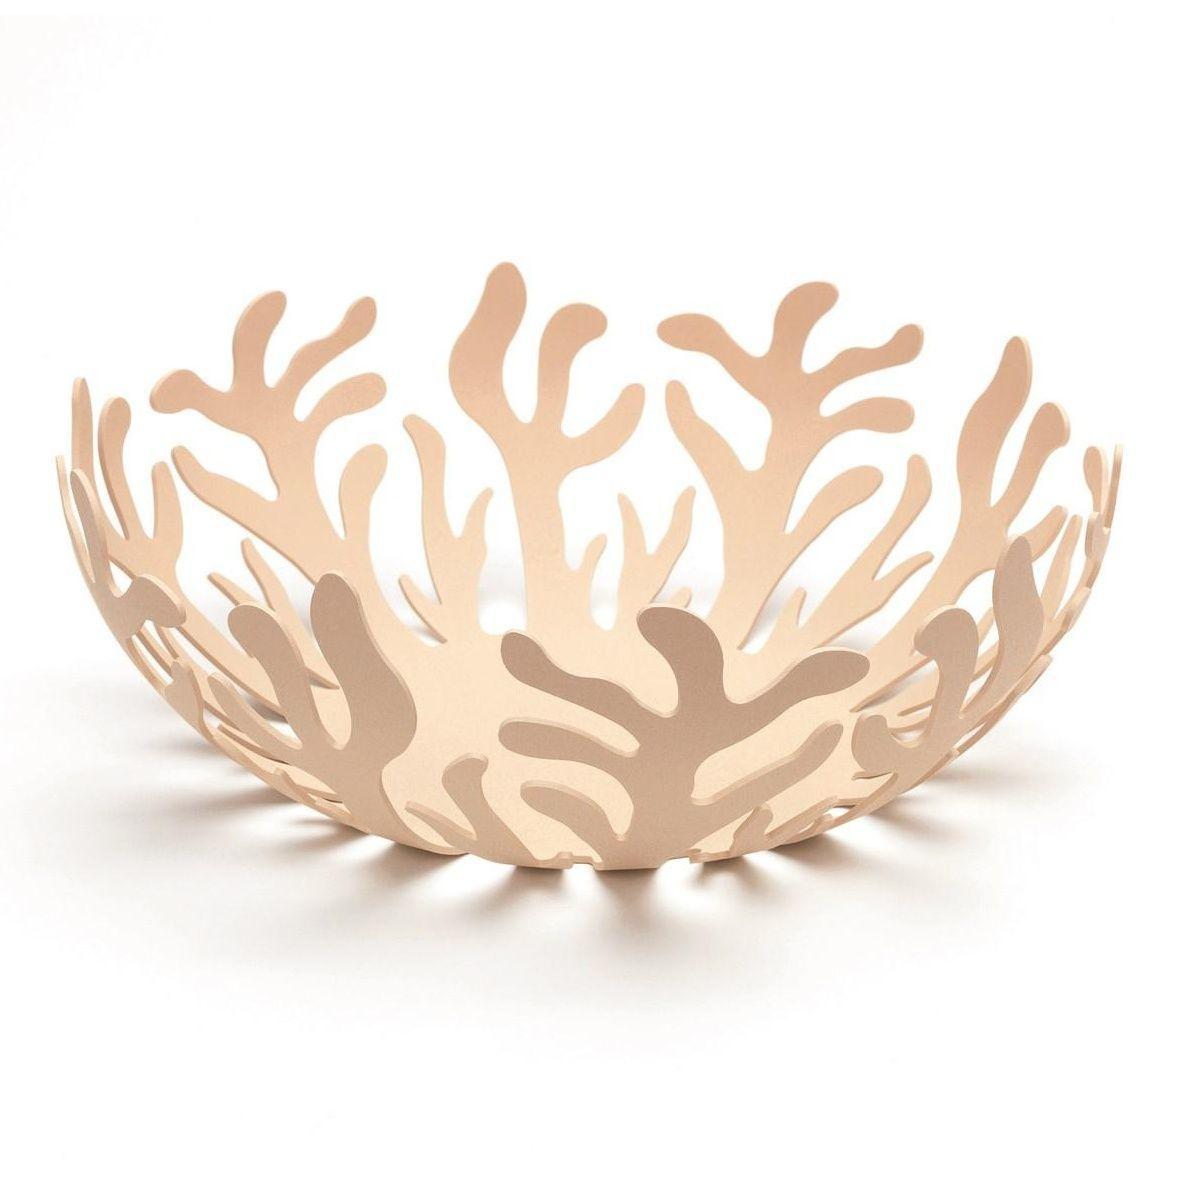 Mediterraneo fruitbowl alessi - Alessi fruit bowl ...